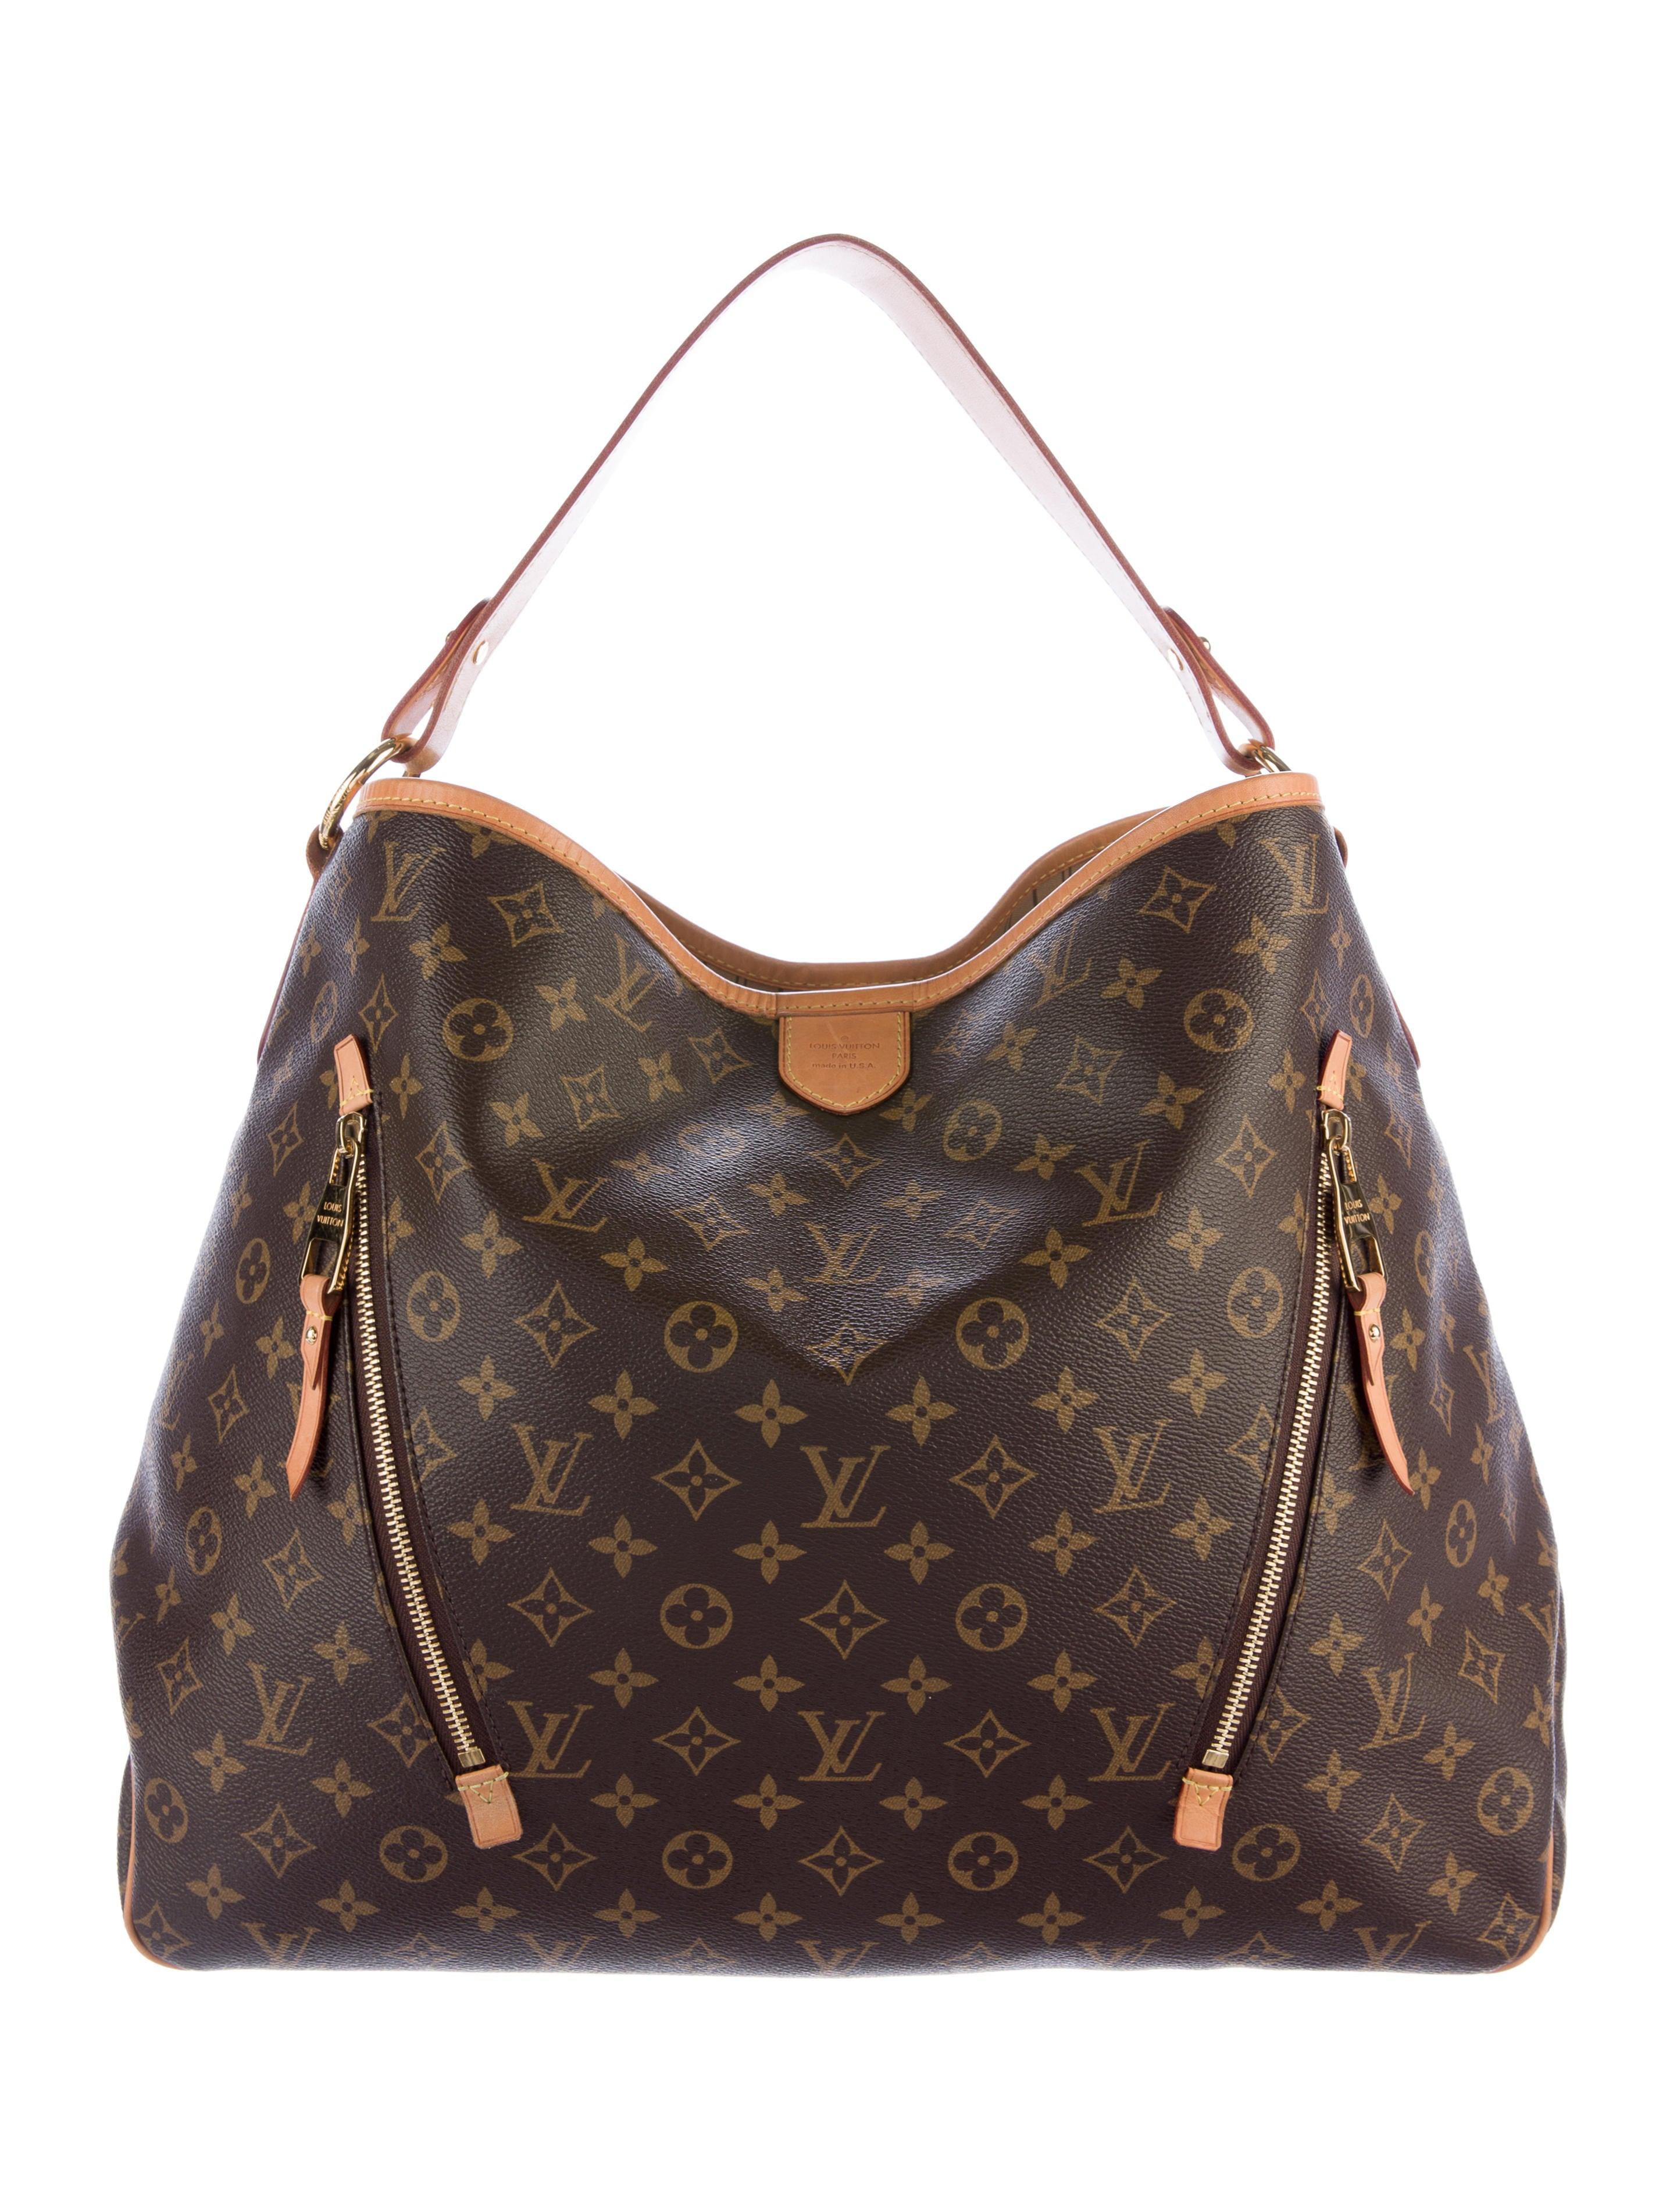 c7bf20c968a Louis Vuitton Monogram Delightful GM - Handbags - LOU107802